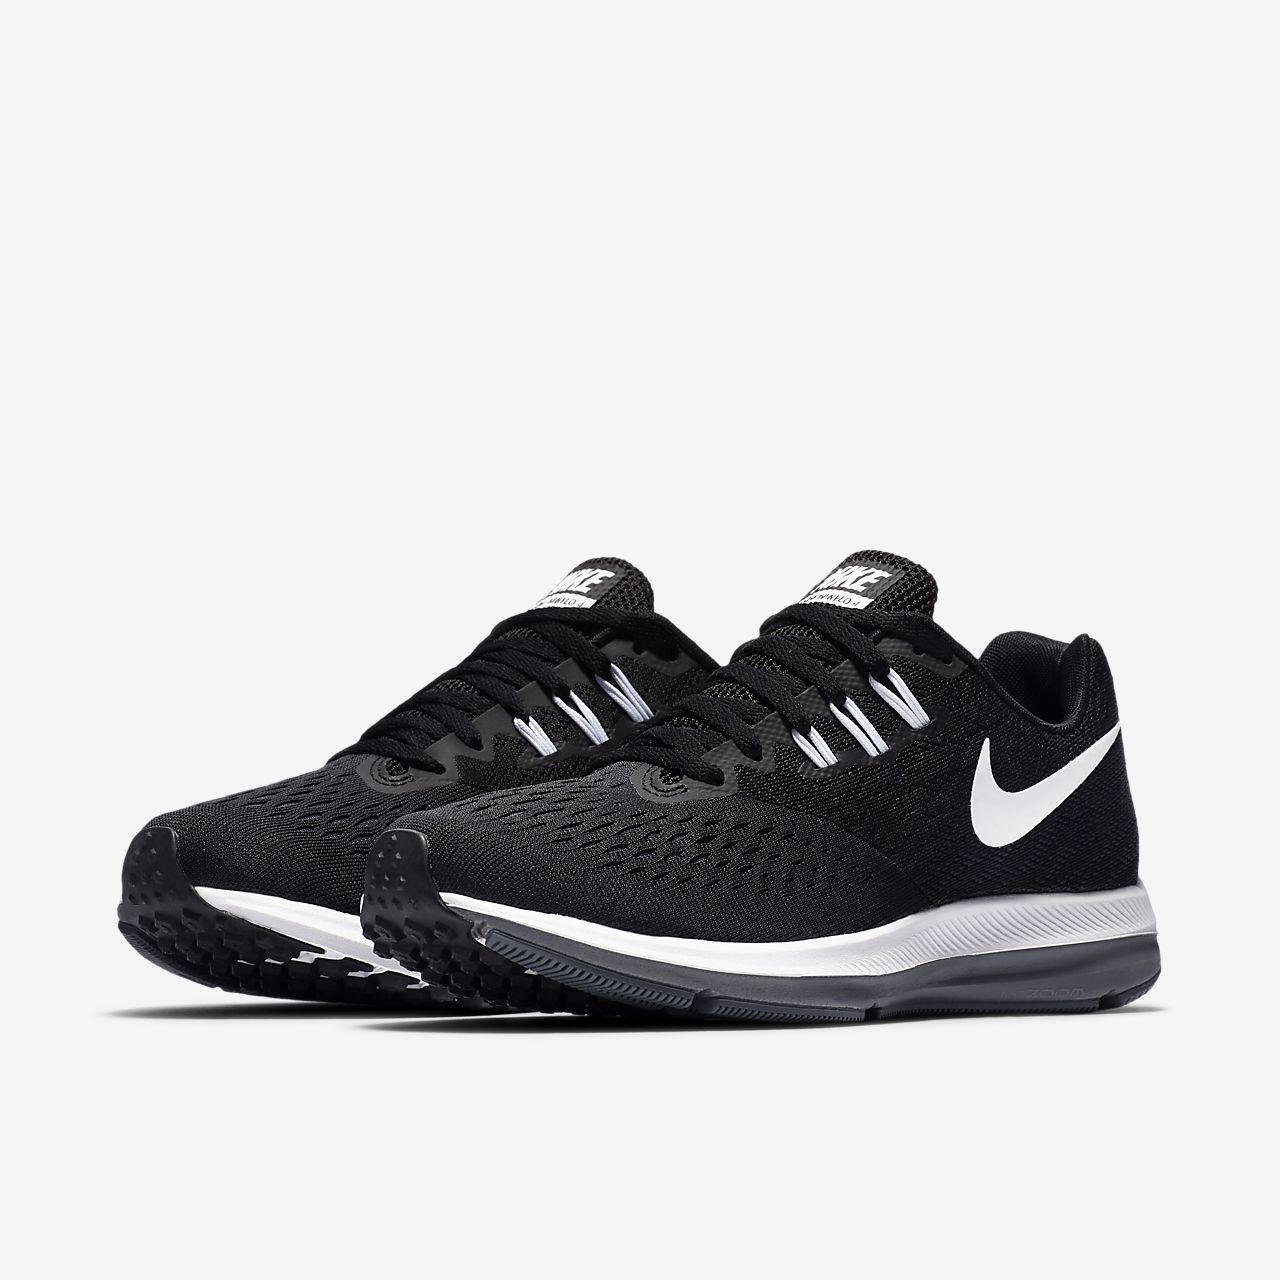 Nike Da Donna Bianco Scarpe Da Ginnastica Misura UK 4 EU 37.5